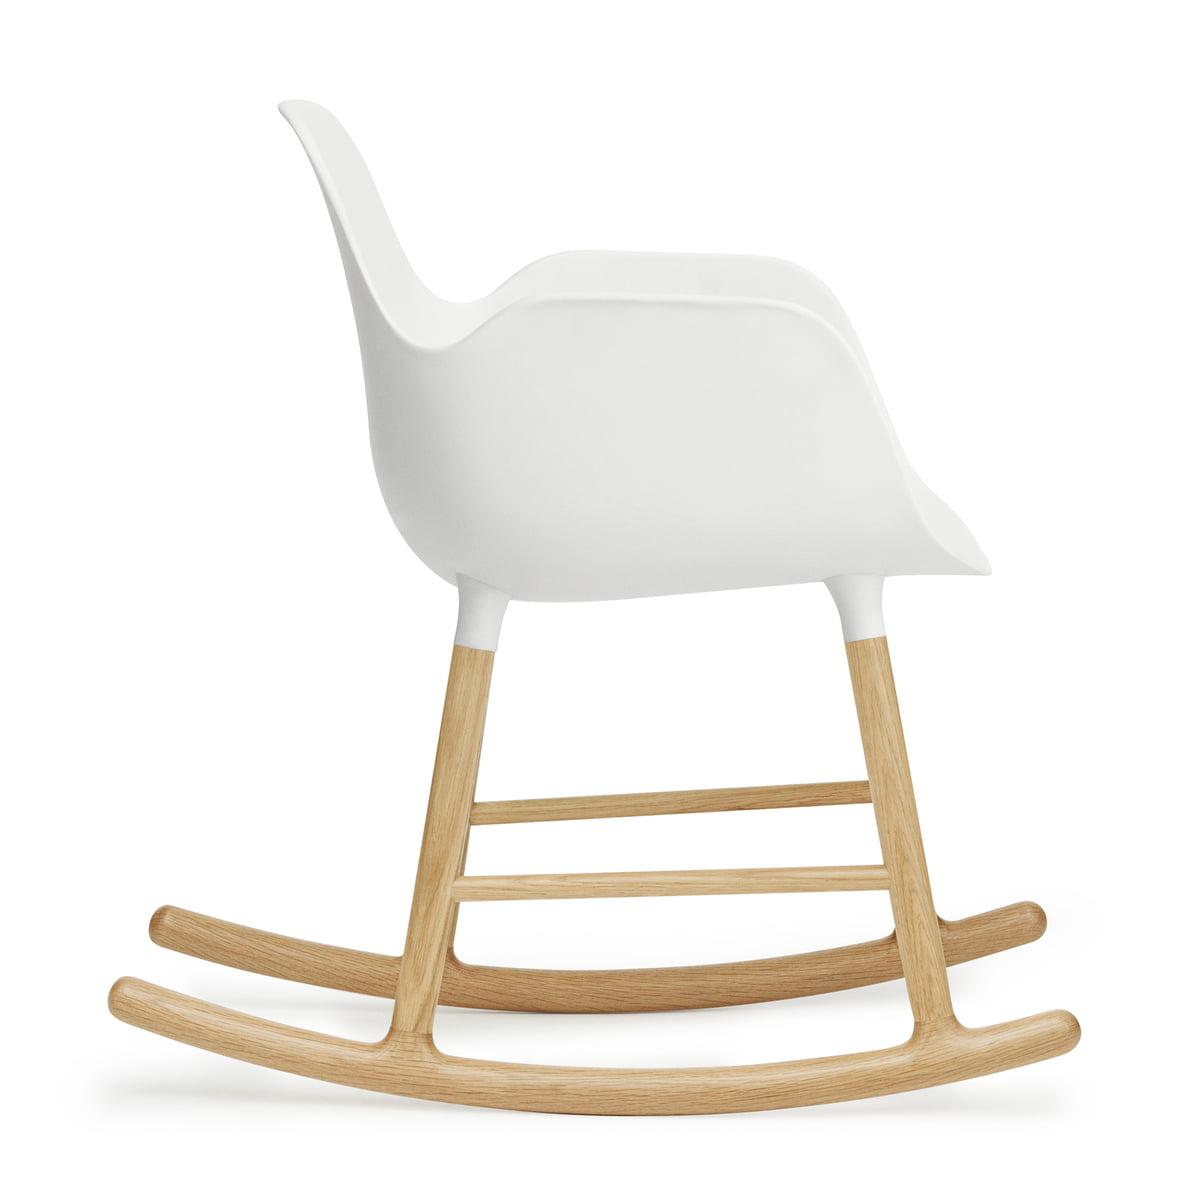 Nice Form Rocking Armchair By Normann Copenhagen Made Of Oak In White